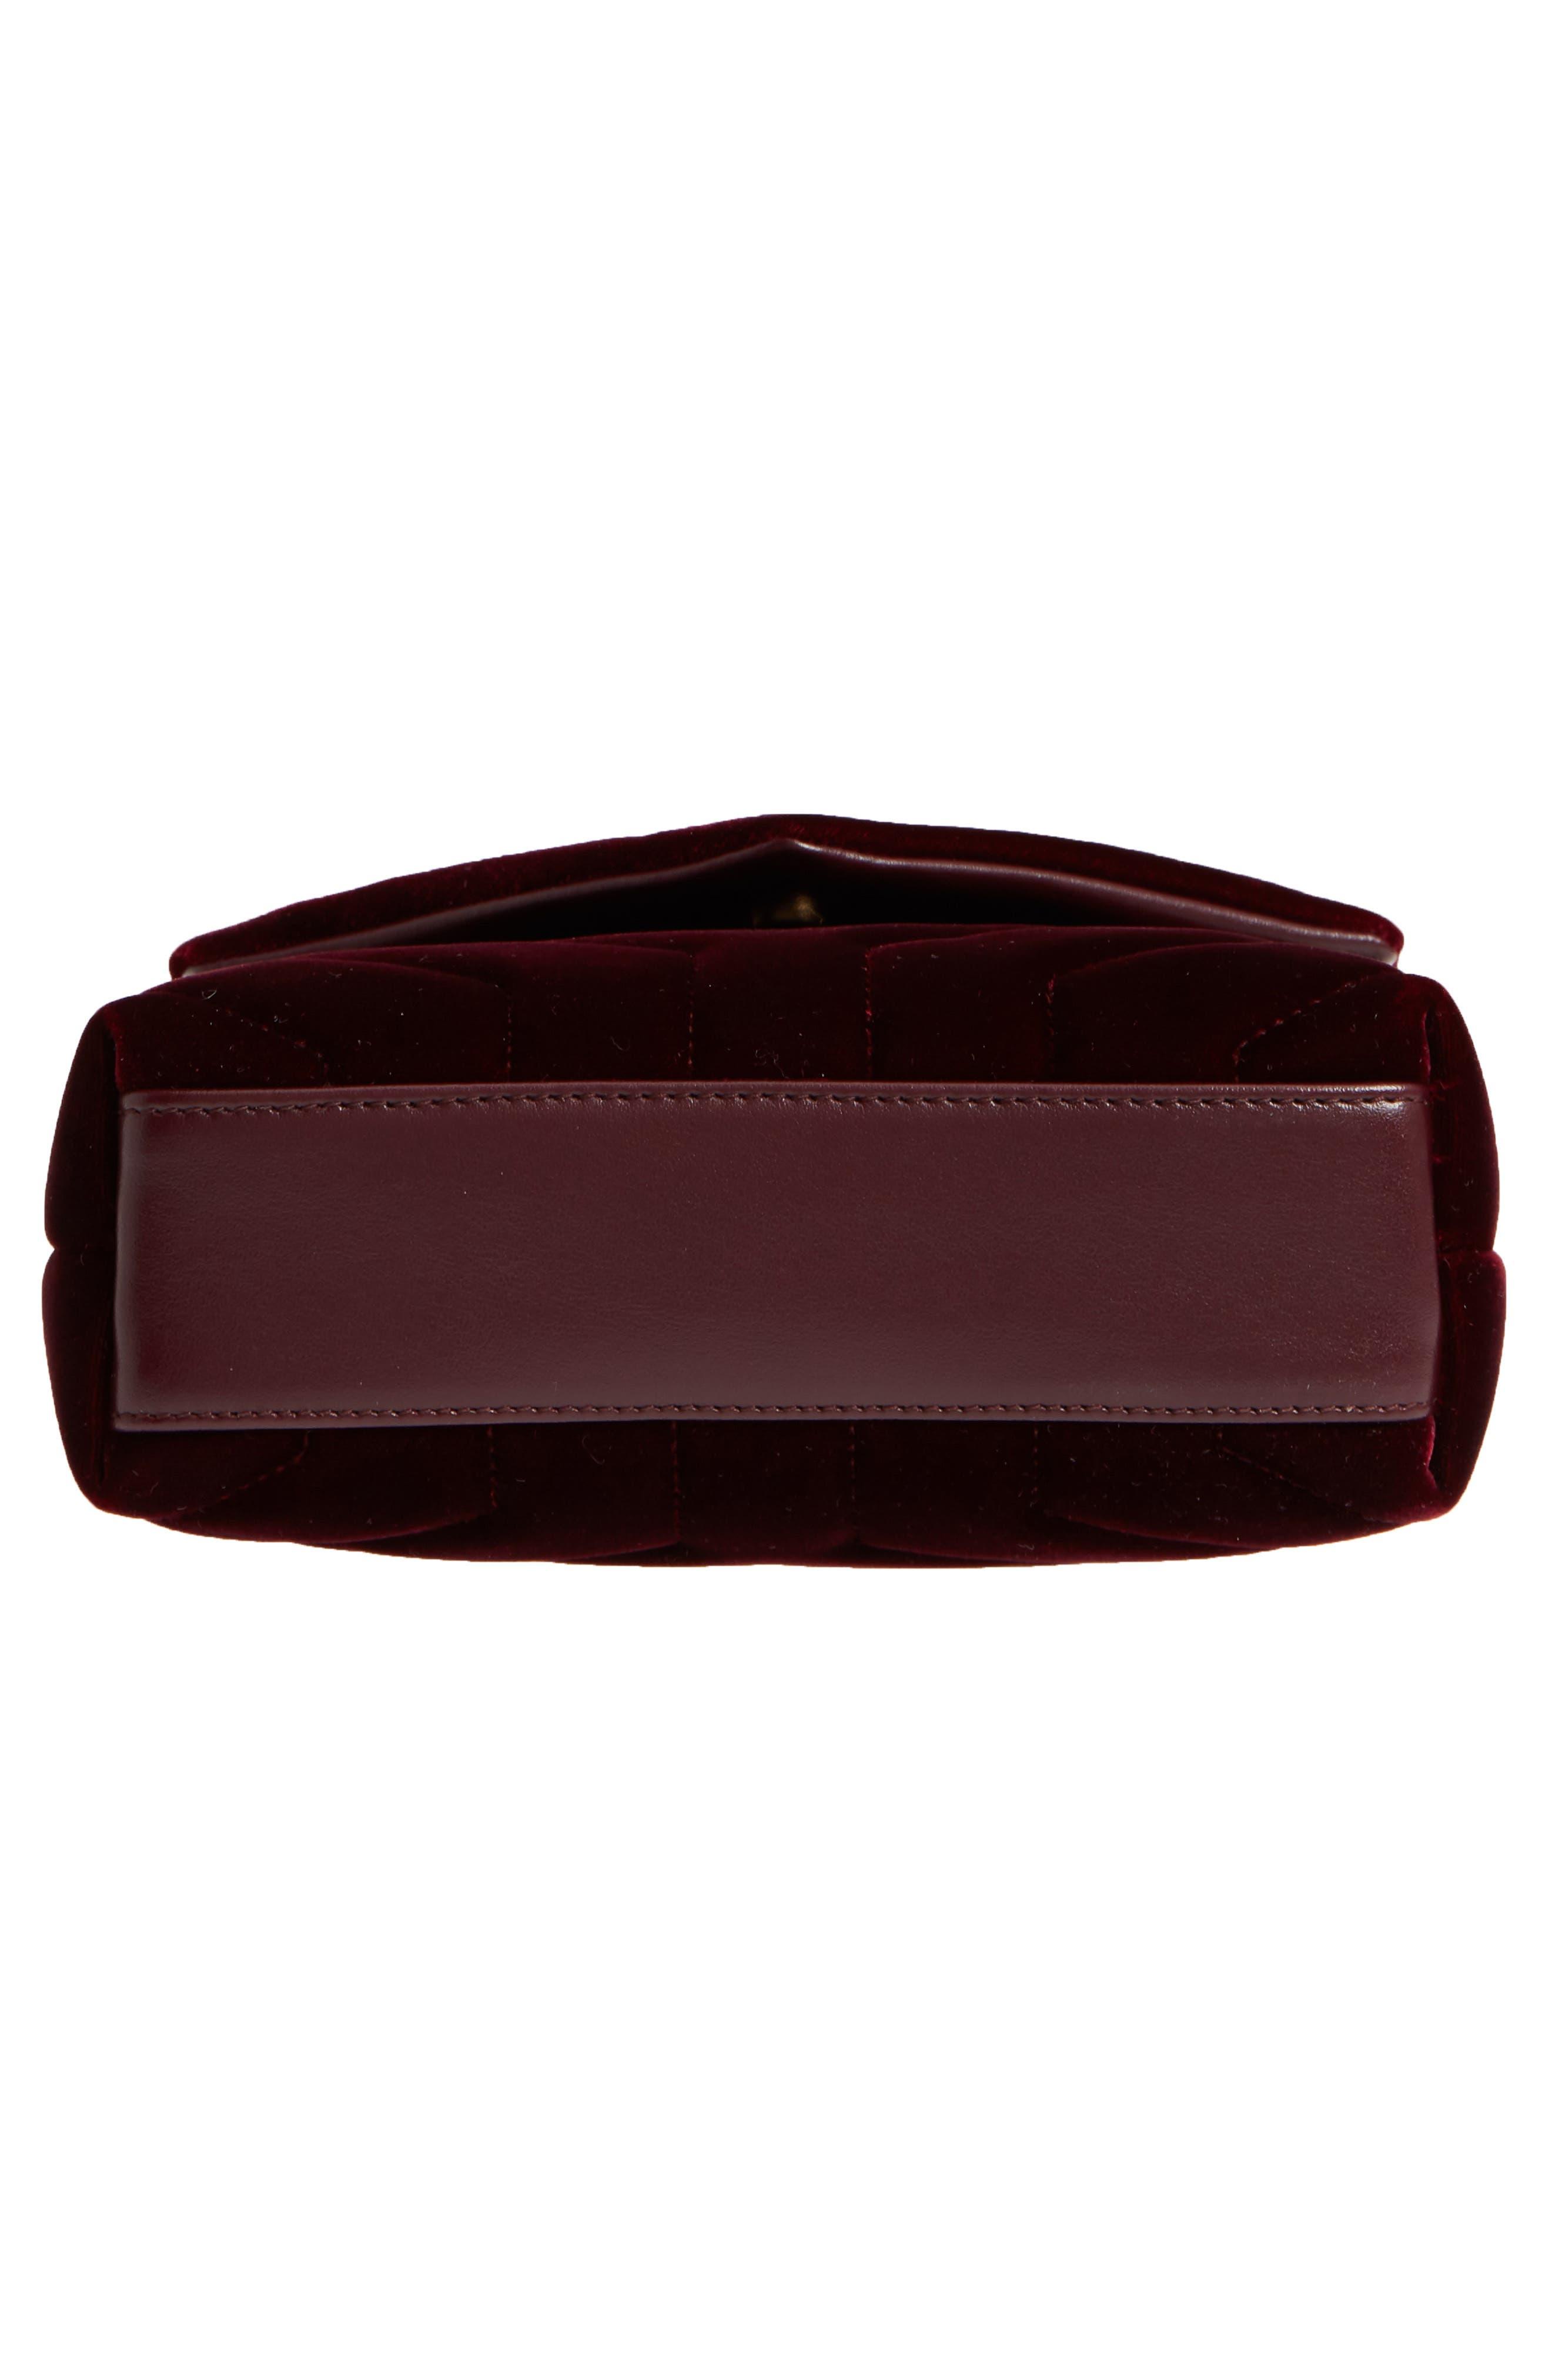 SAINT LAURENT,                             Toy Loulou Velvet Crossbody Bag,                             Alternate thumbnail 6, color,                             930